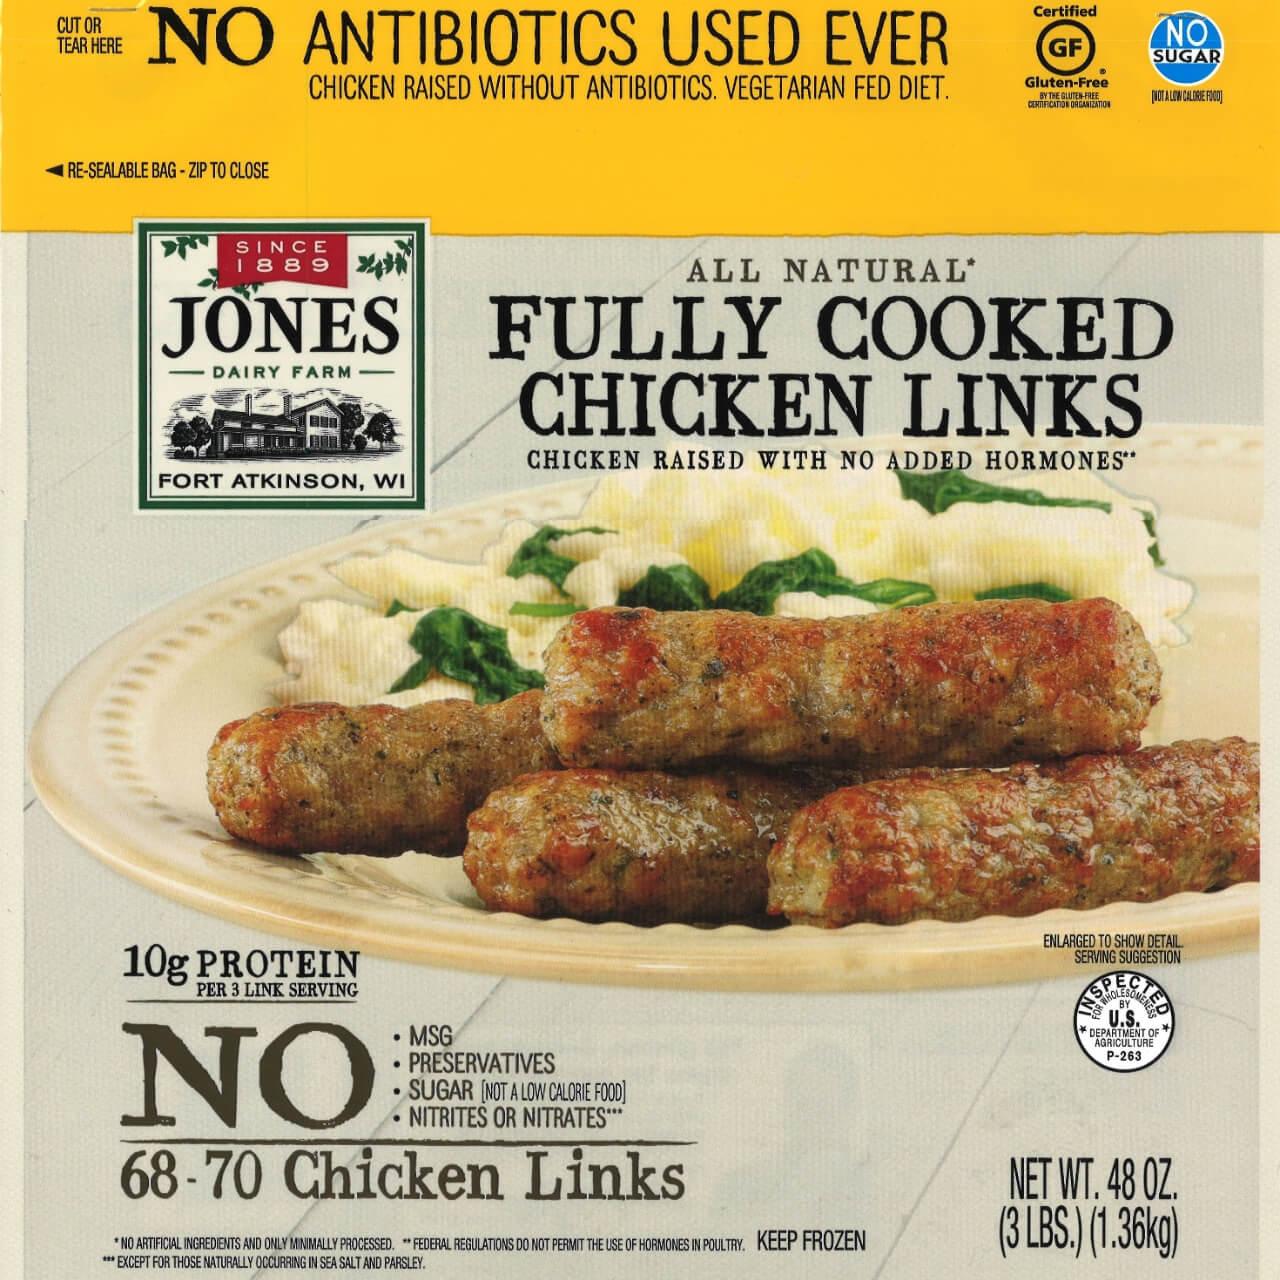 Chicken Links